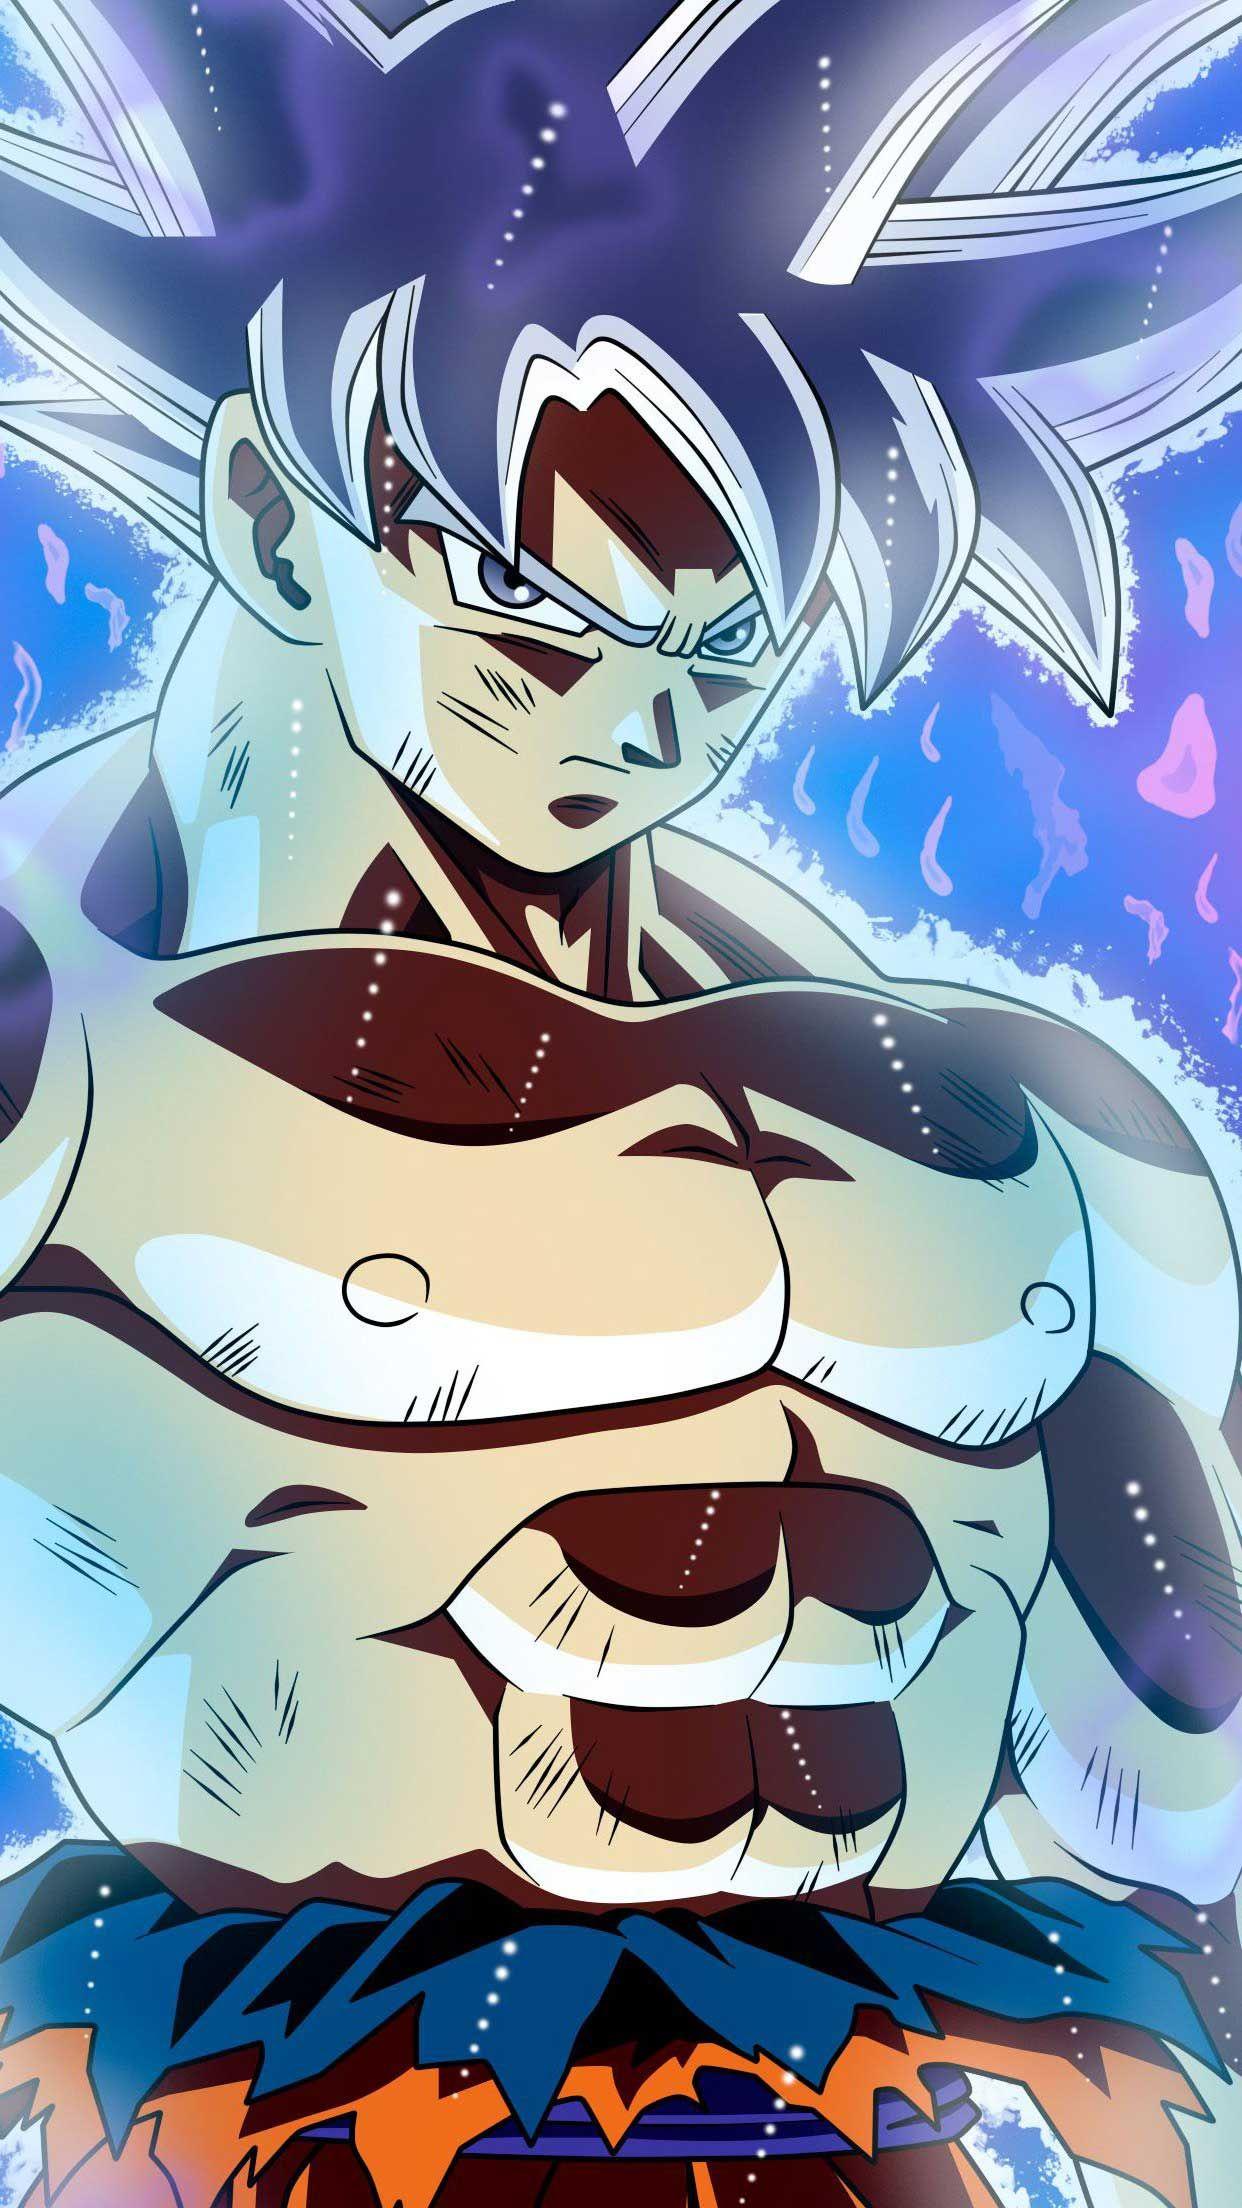 Goku Migatte No Gokui Perfecto Ultra Instinct Dragon Ball Wr Iphone Wallpapers Hd Dragon Ball Super Wallpapers Goku Wallpaper Goku Wallpaper Iphone